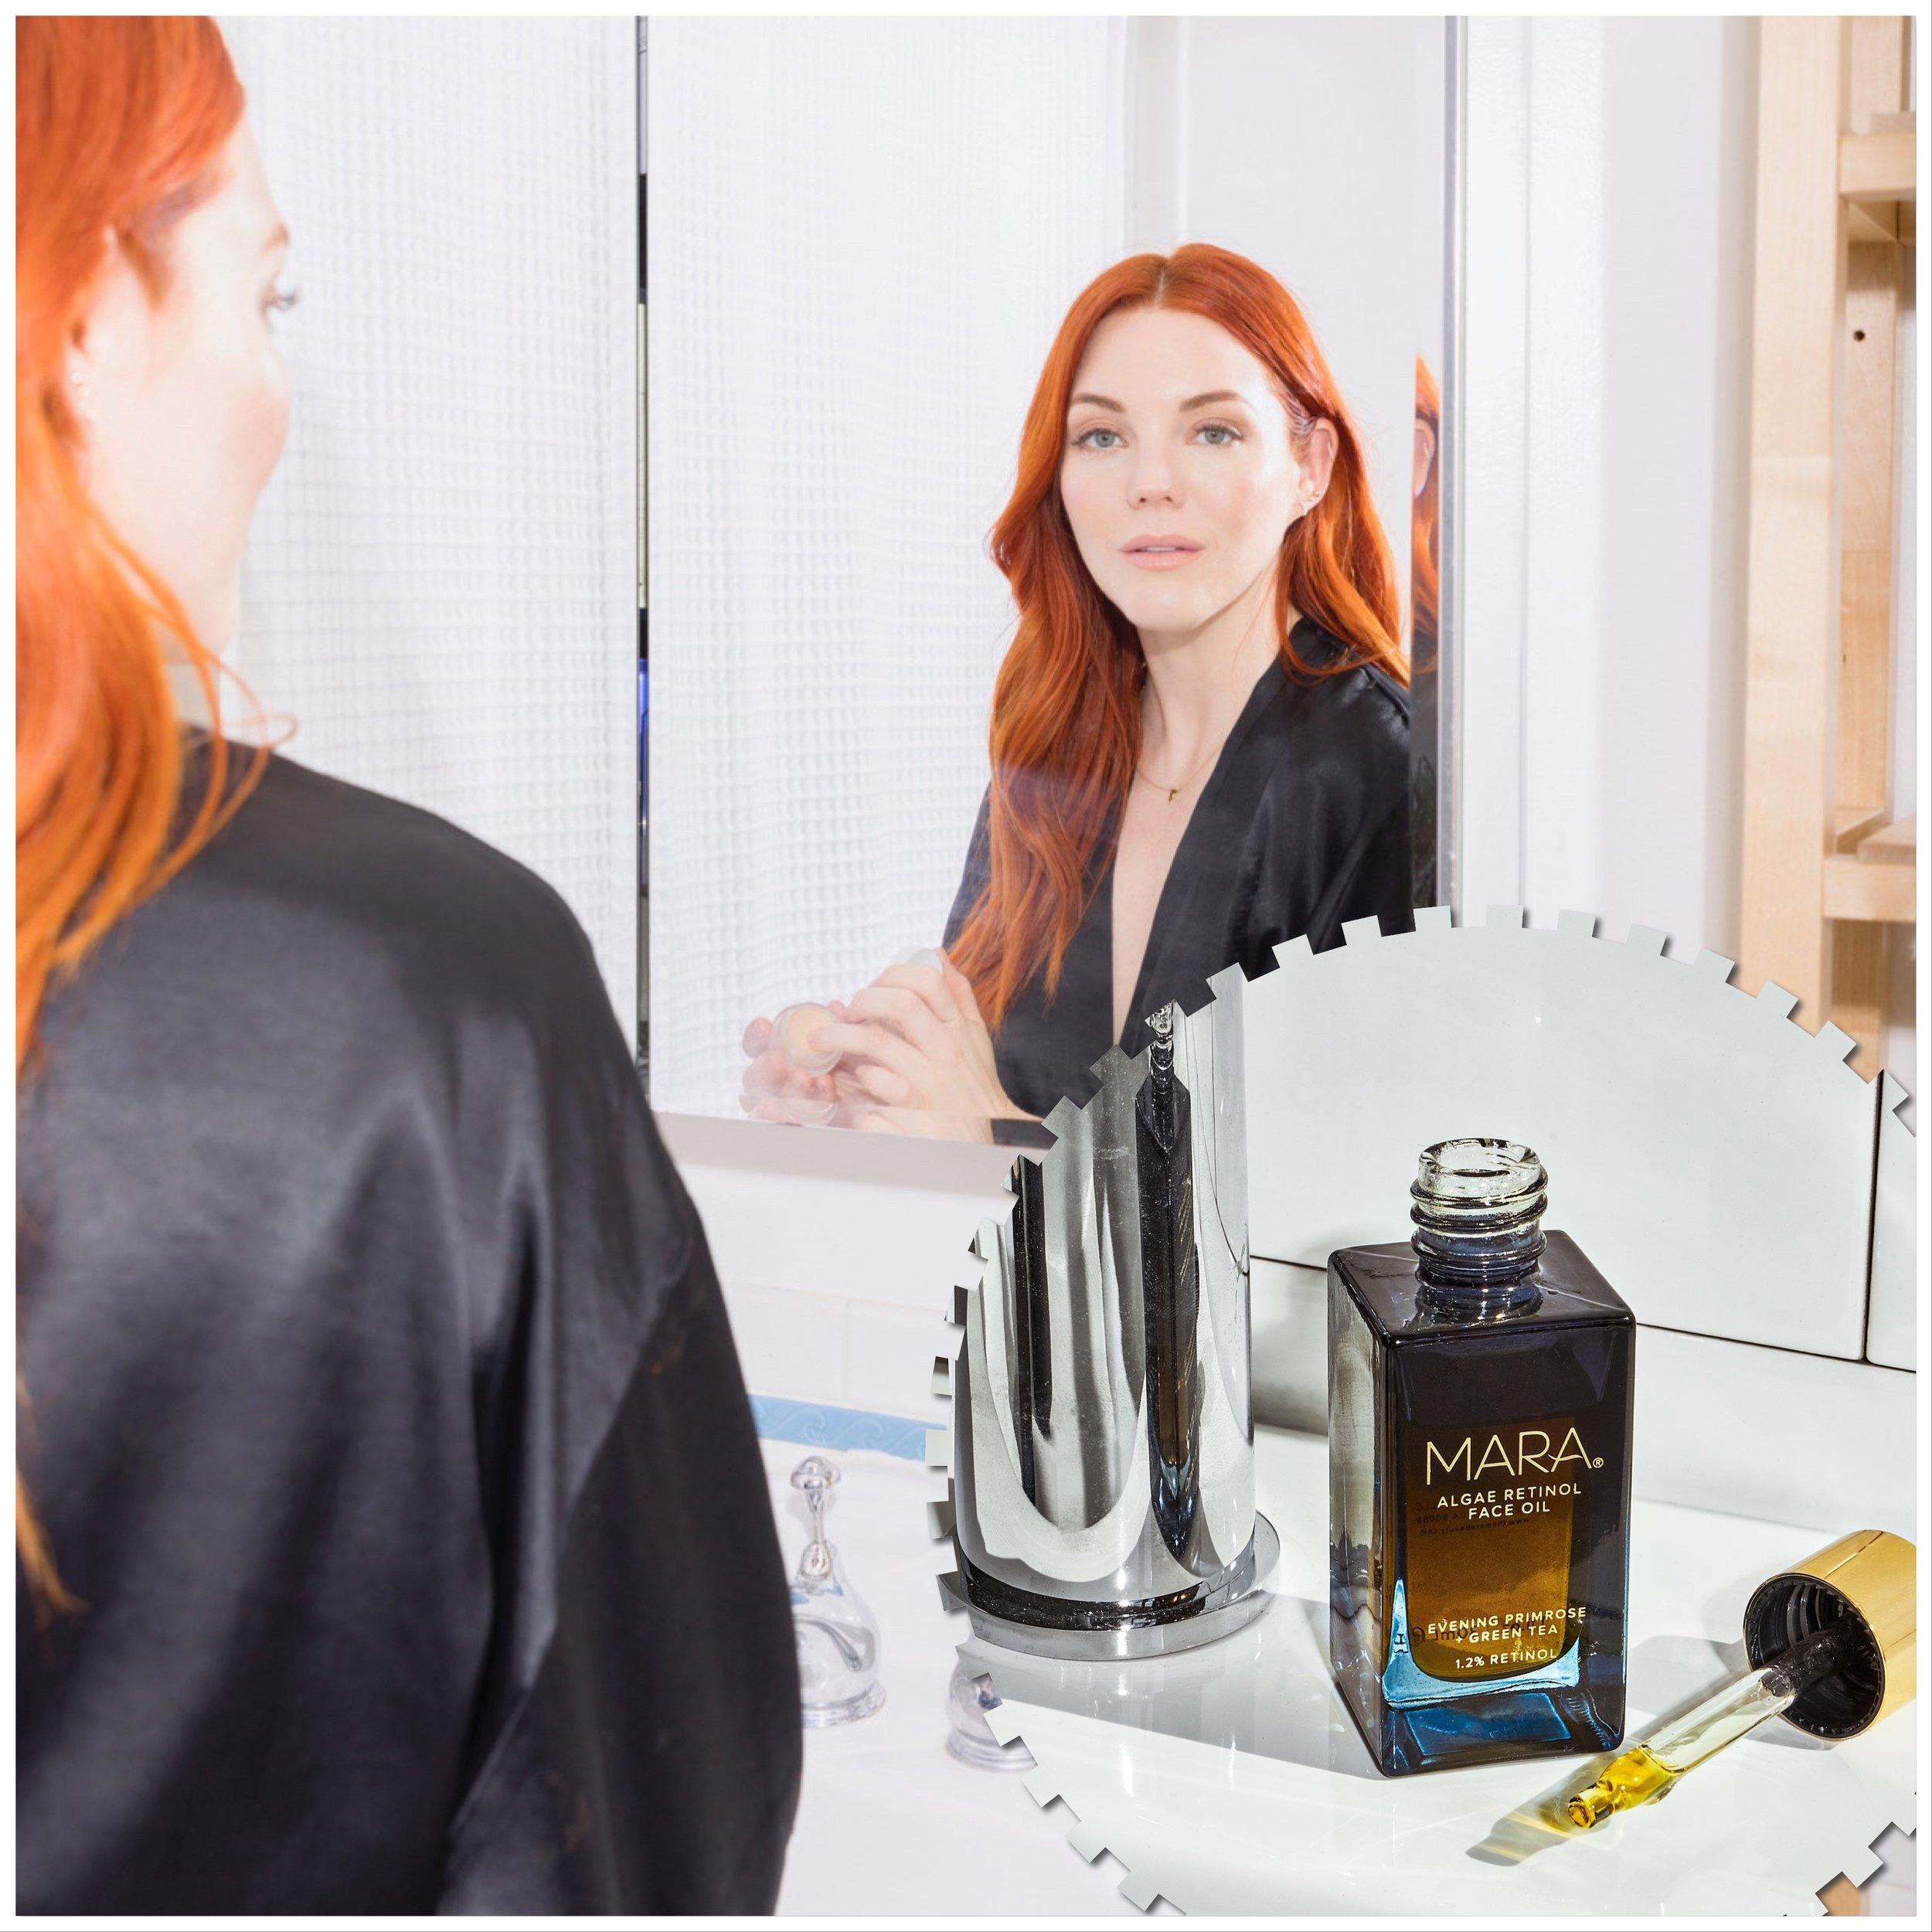 Allison McNamara and her latest addition to Mara beauty, Algae Retinol Face Oil.